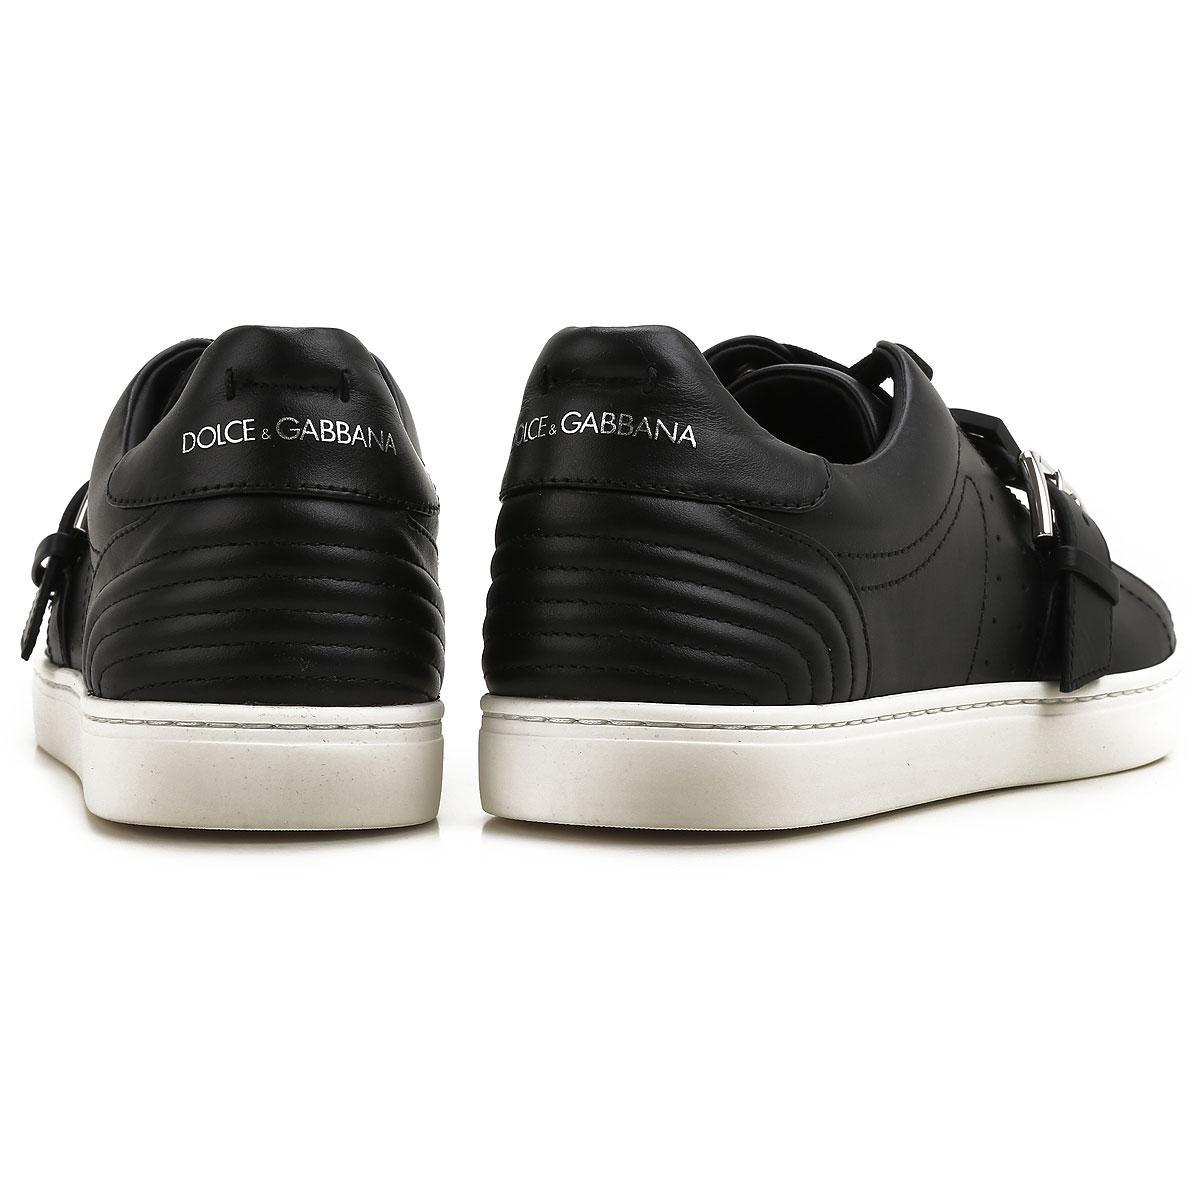 Sneaker Homme Pas cher en Soldes Outlet